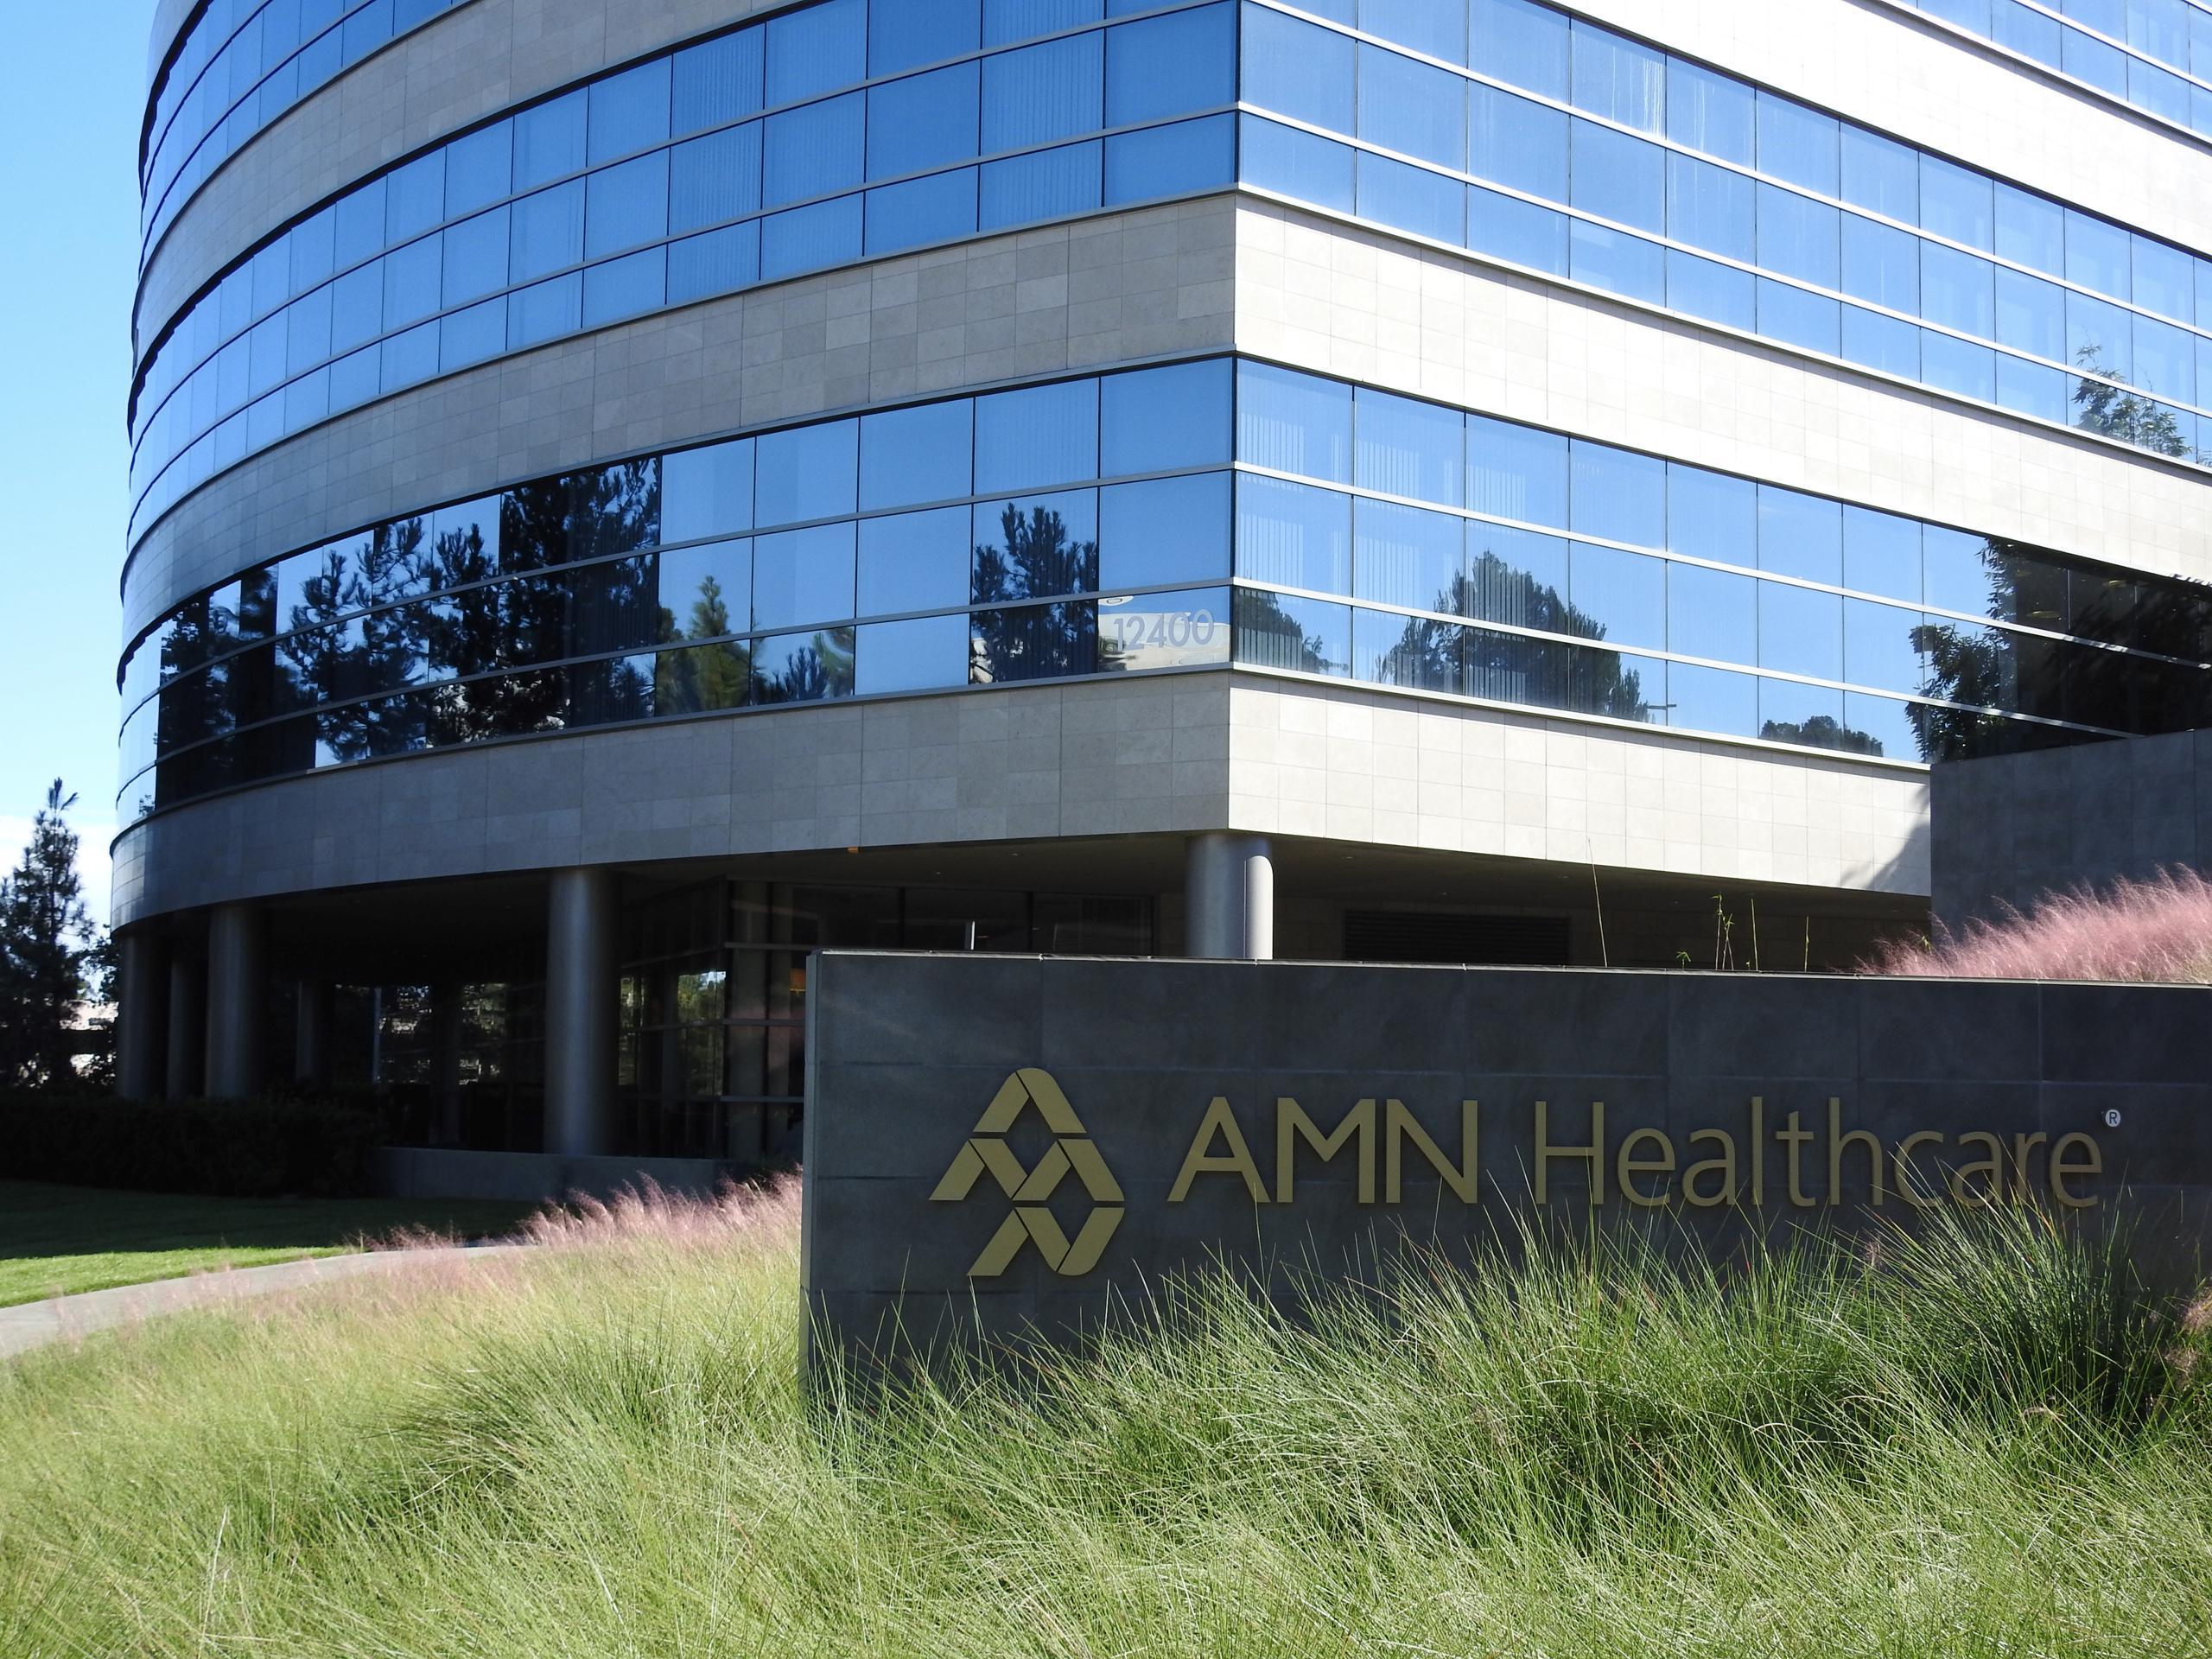 AMN Healthcare's corporate headquarters in San Diego, California.